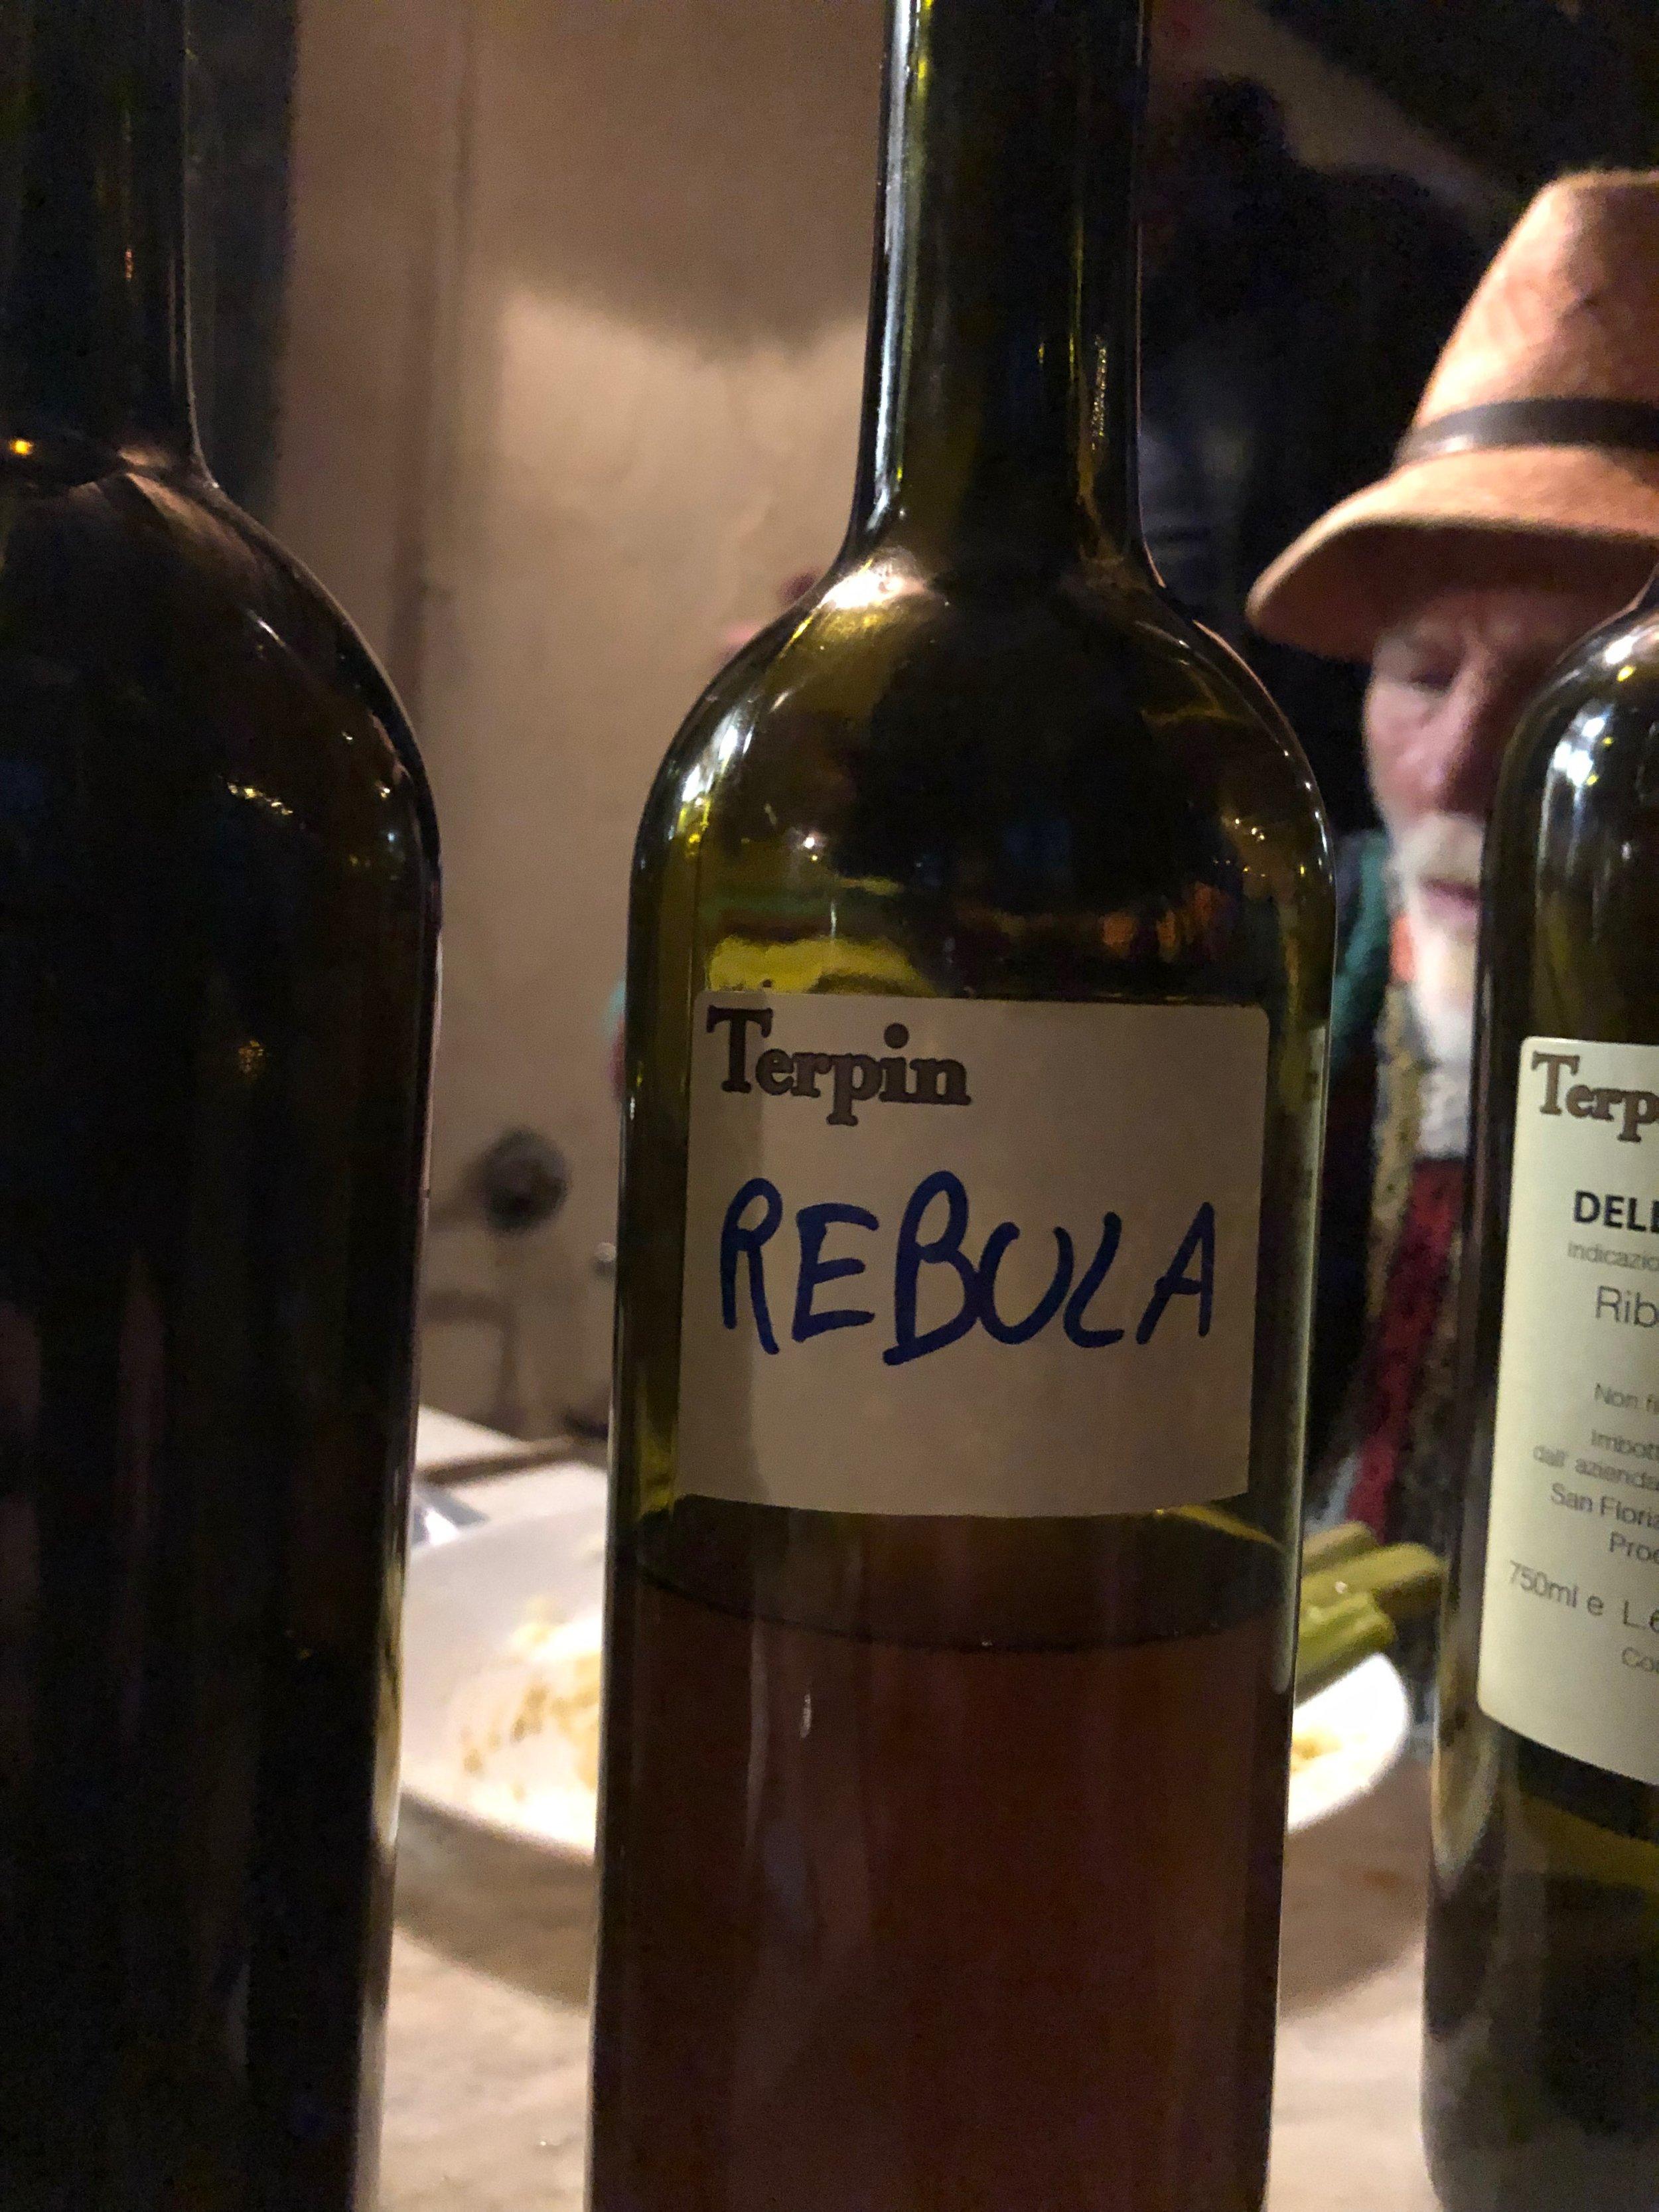 Terpin Rebula.jpg